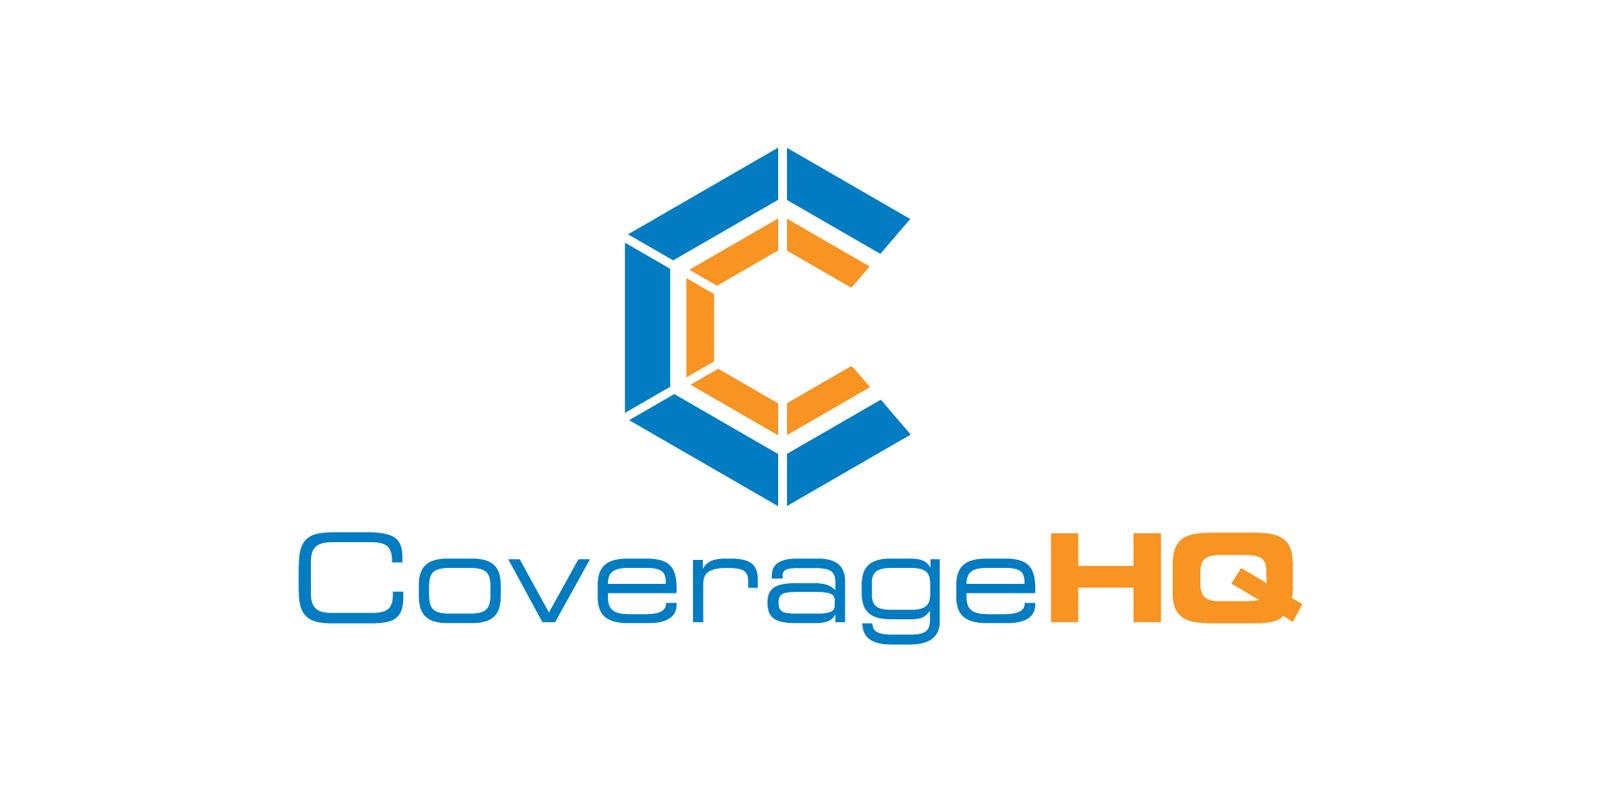 CoverageHQ_00.jpg